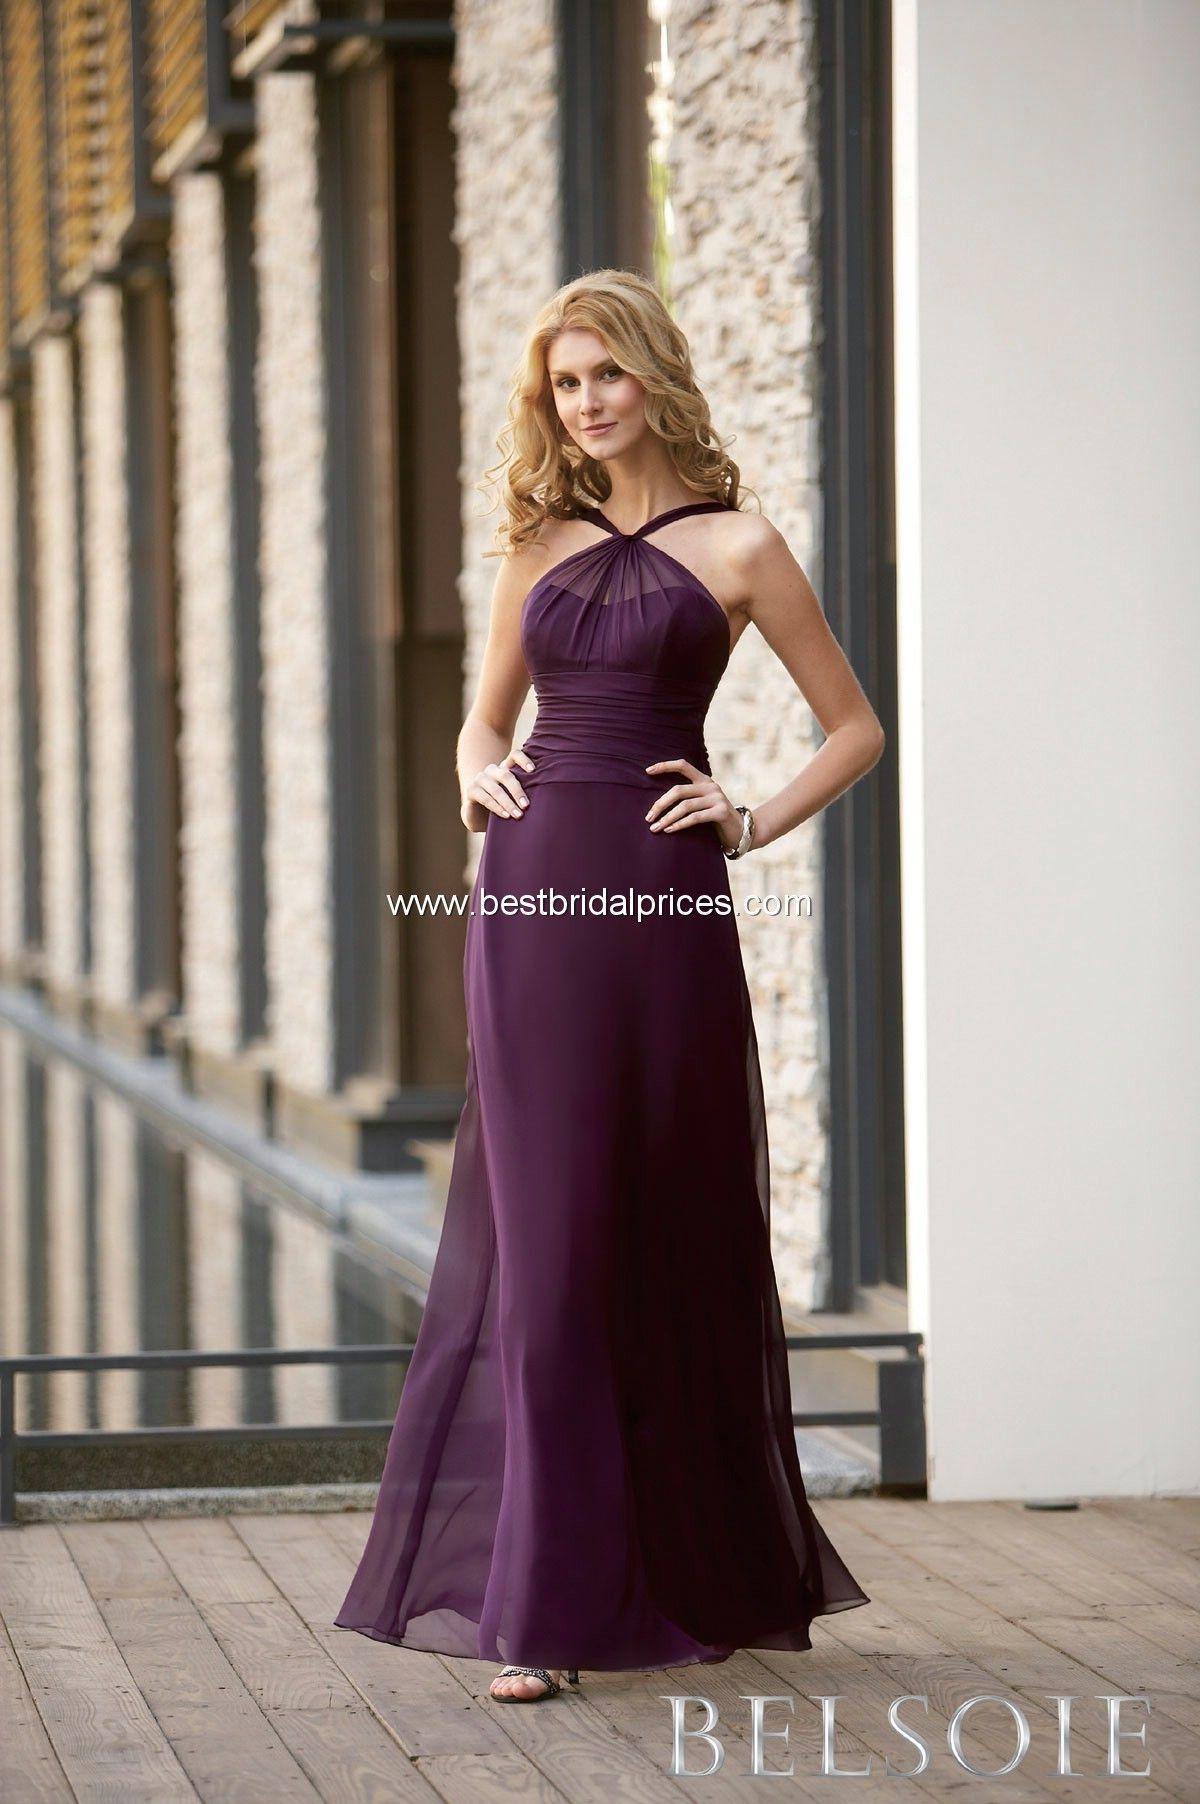 Jasmine Belsoie Bridesmaid Dresses Style L2063 Wedding